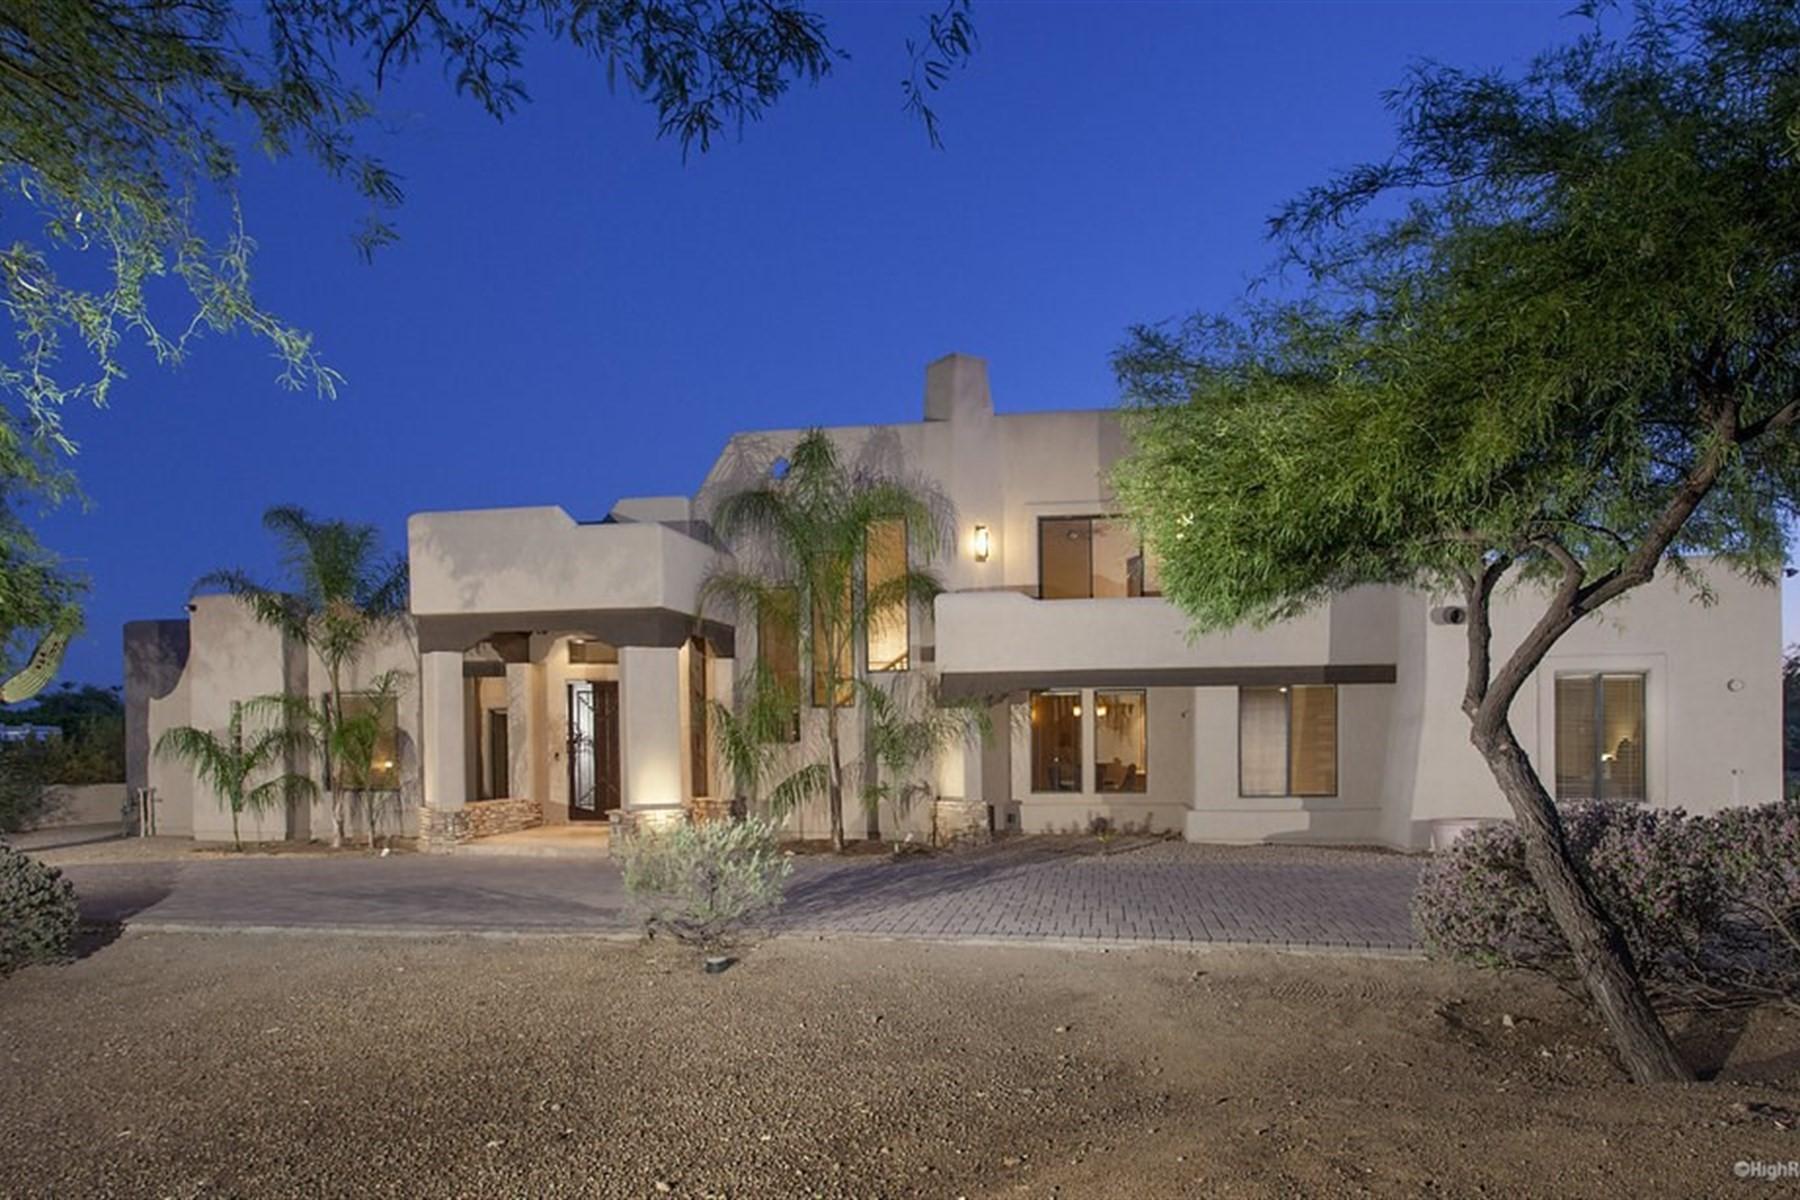 Villa per Vendita alle ore Charming custom home in Shea Corridor 9880 N 110th Street Scottsdale, Arizona, 85259 Stati Uniti